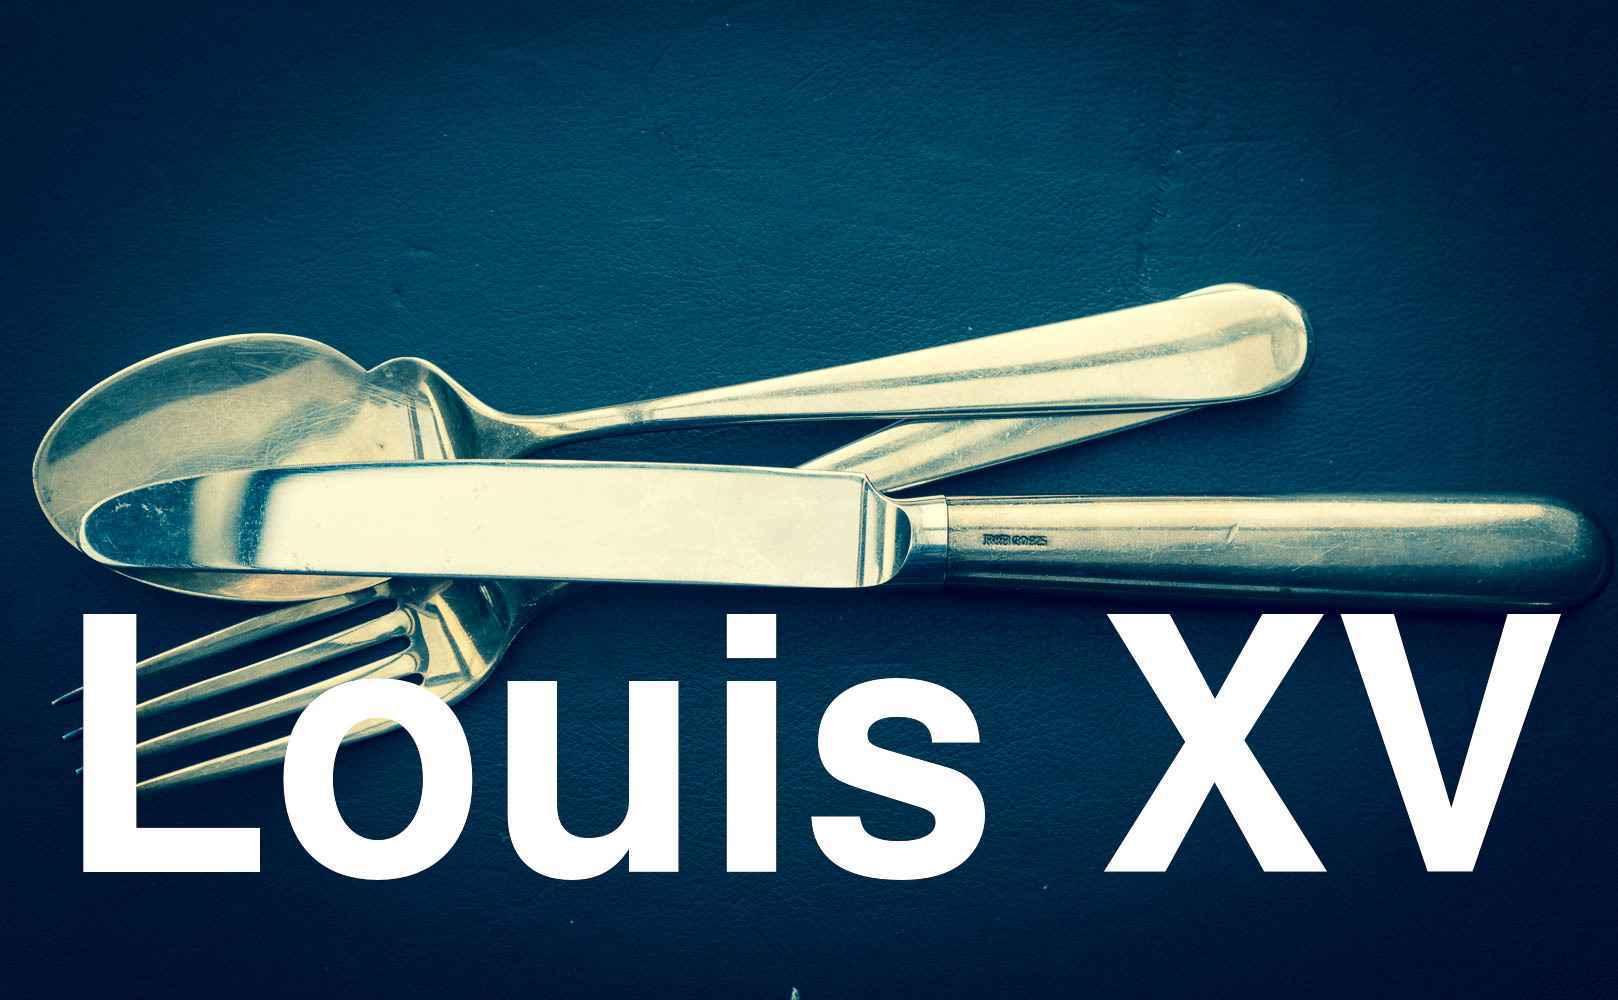 Restaurantkritik: Louis XV in MC 9800 Principauté de Monaco, Monaco